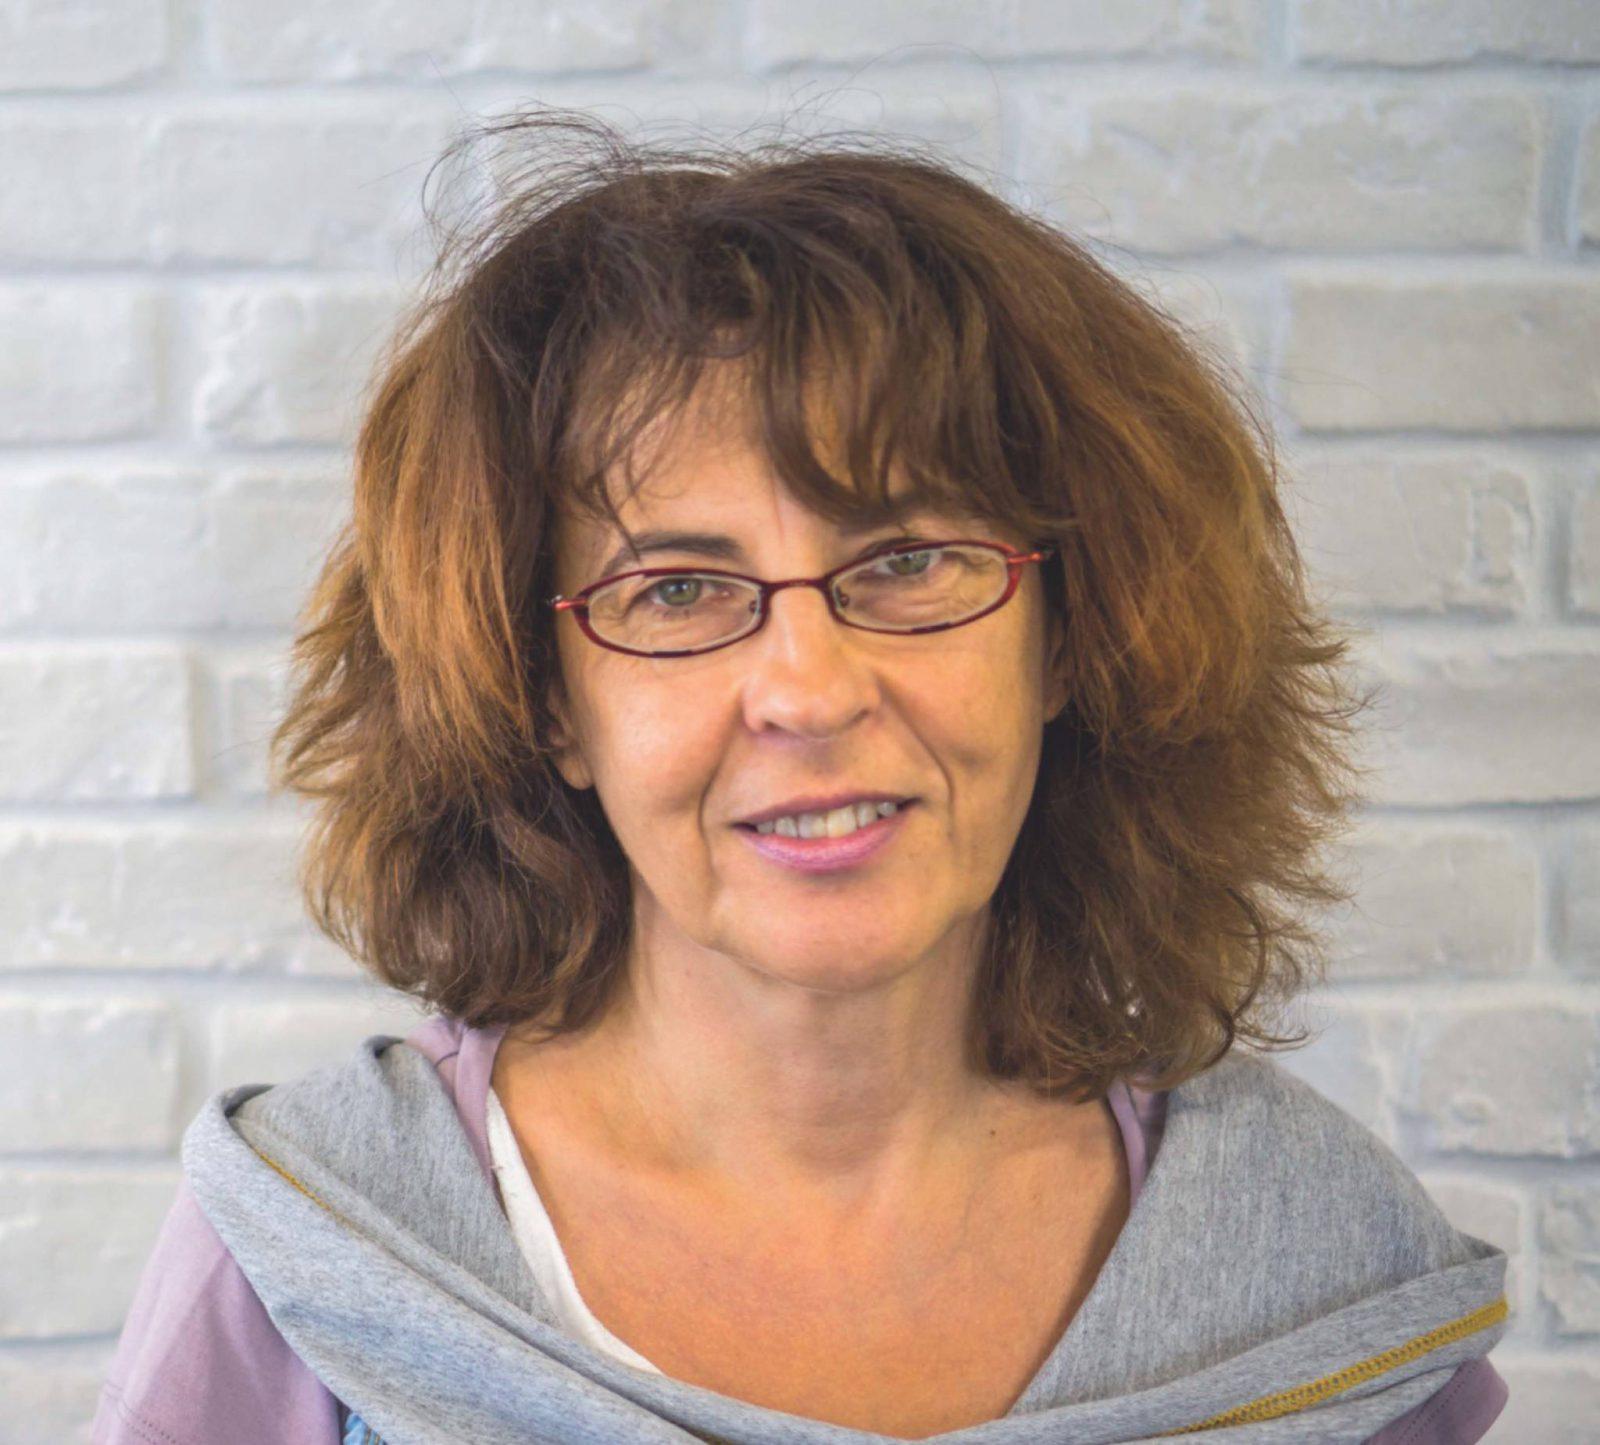 Ewa Klepacka-Gryz